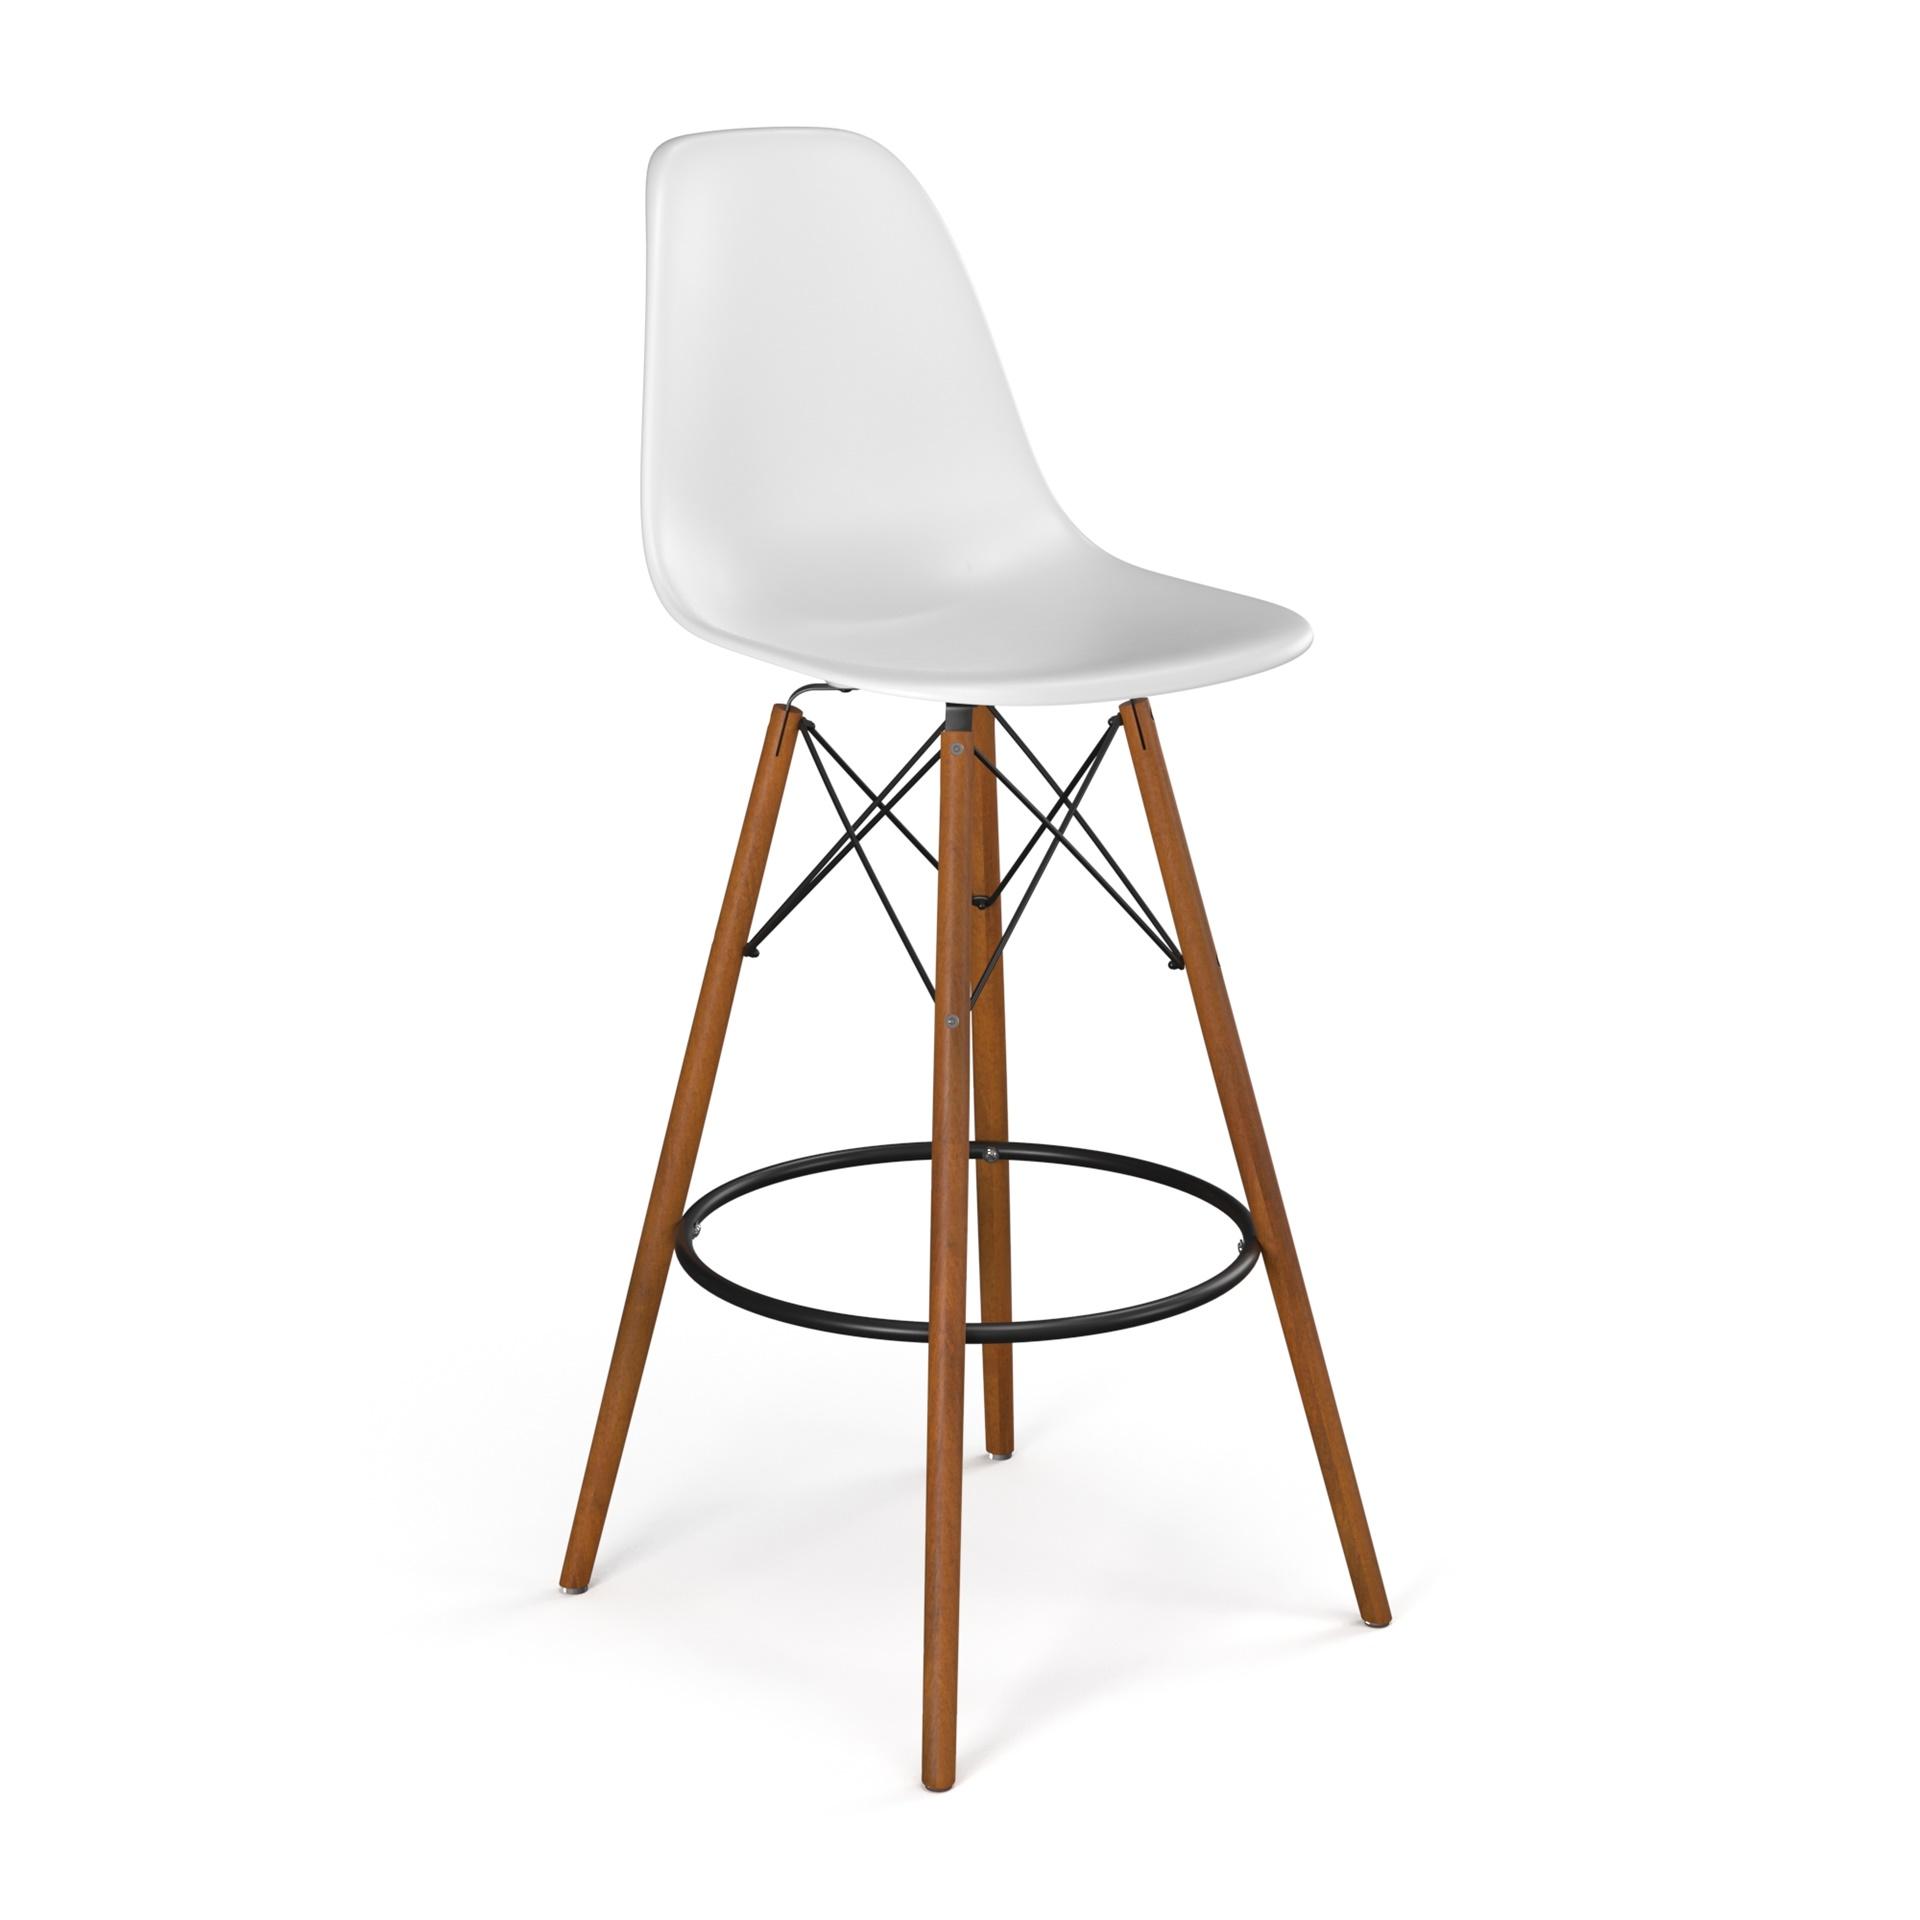 Molded plastic bar stool with wood legs